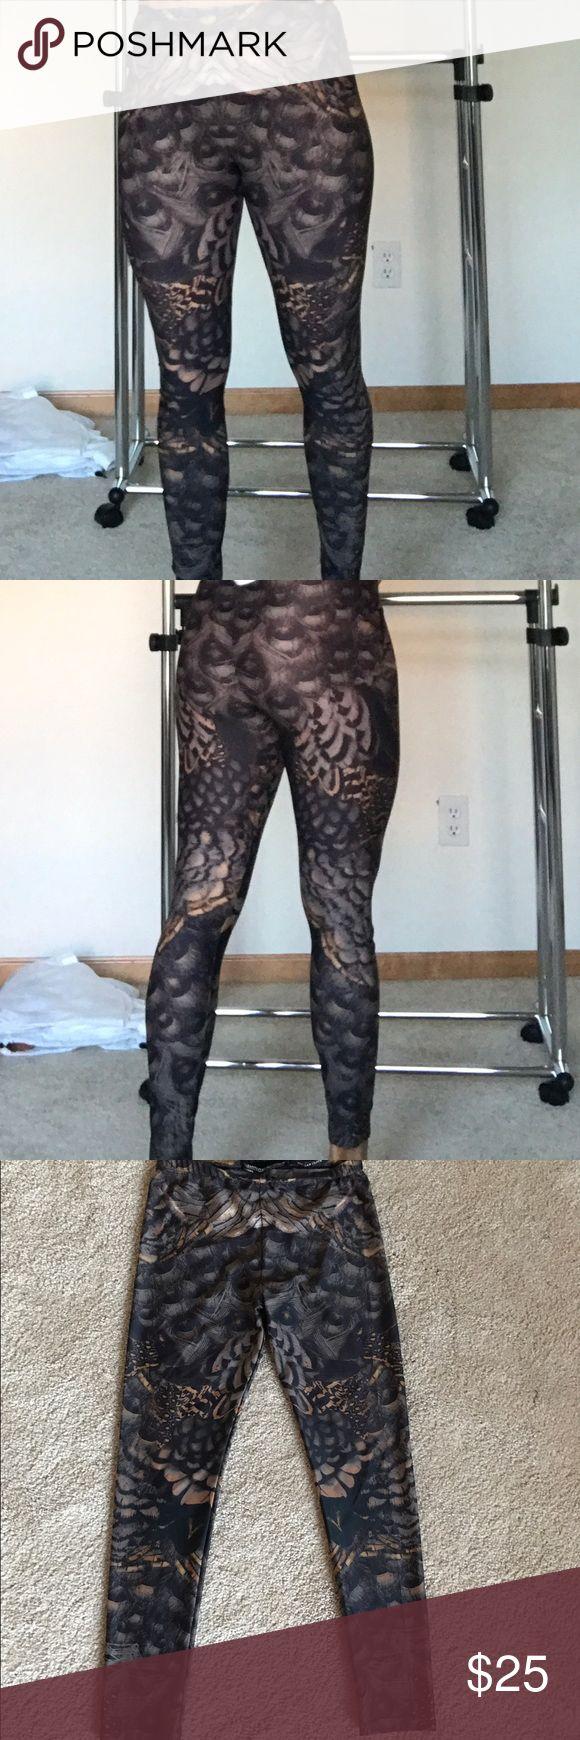 Allsaints leggings. Funky leggings in super quality. Excellent condition, like new. allsaints Pants Leggings